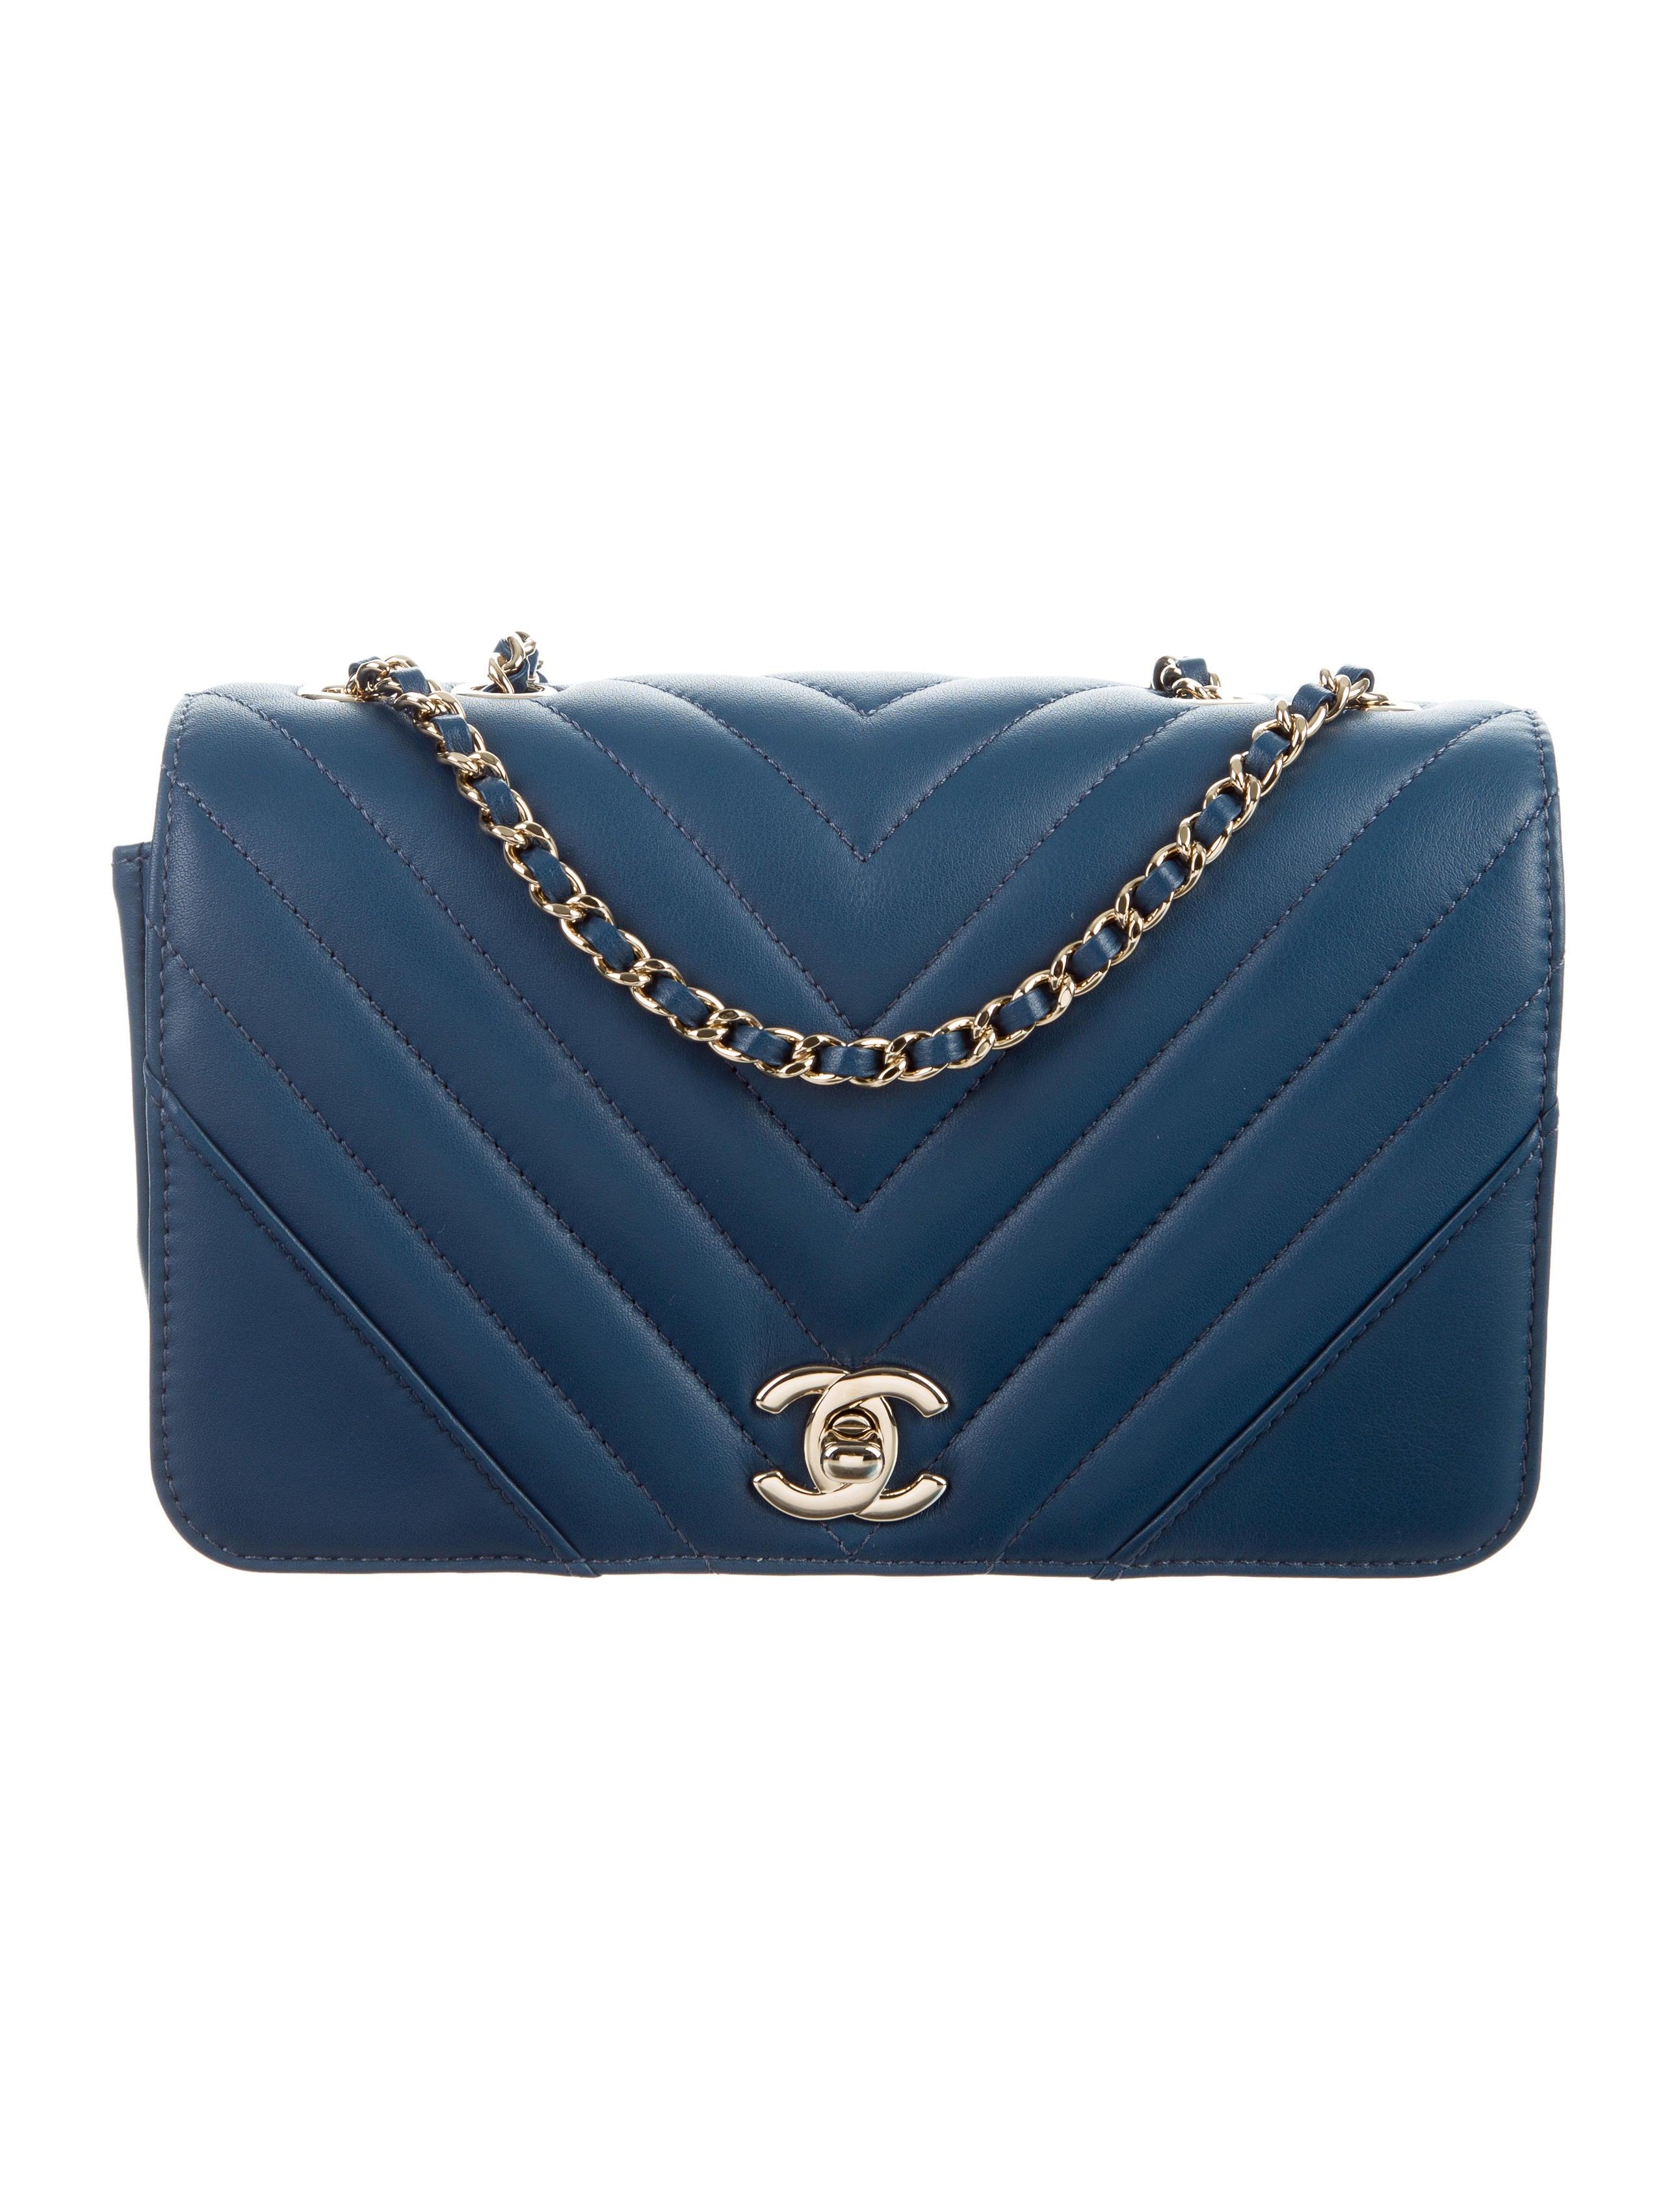 b144191ab Chanel 2017 Chevron Statement Flap Bag - Handbags - CHA224429 | The RealReal